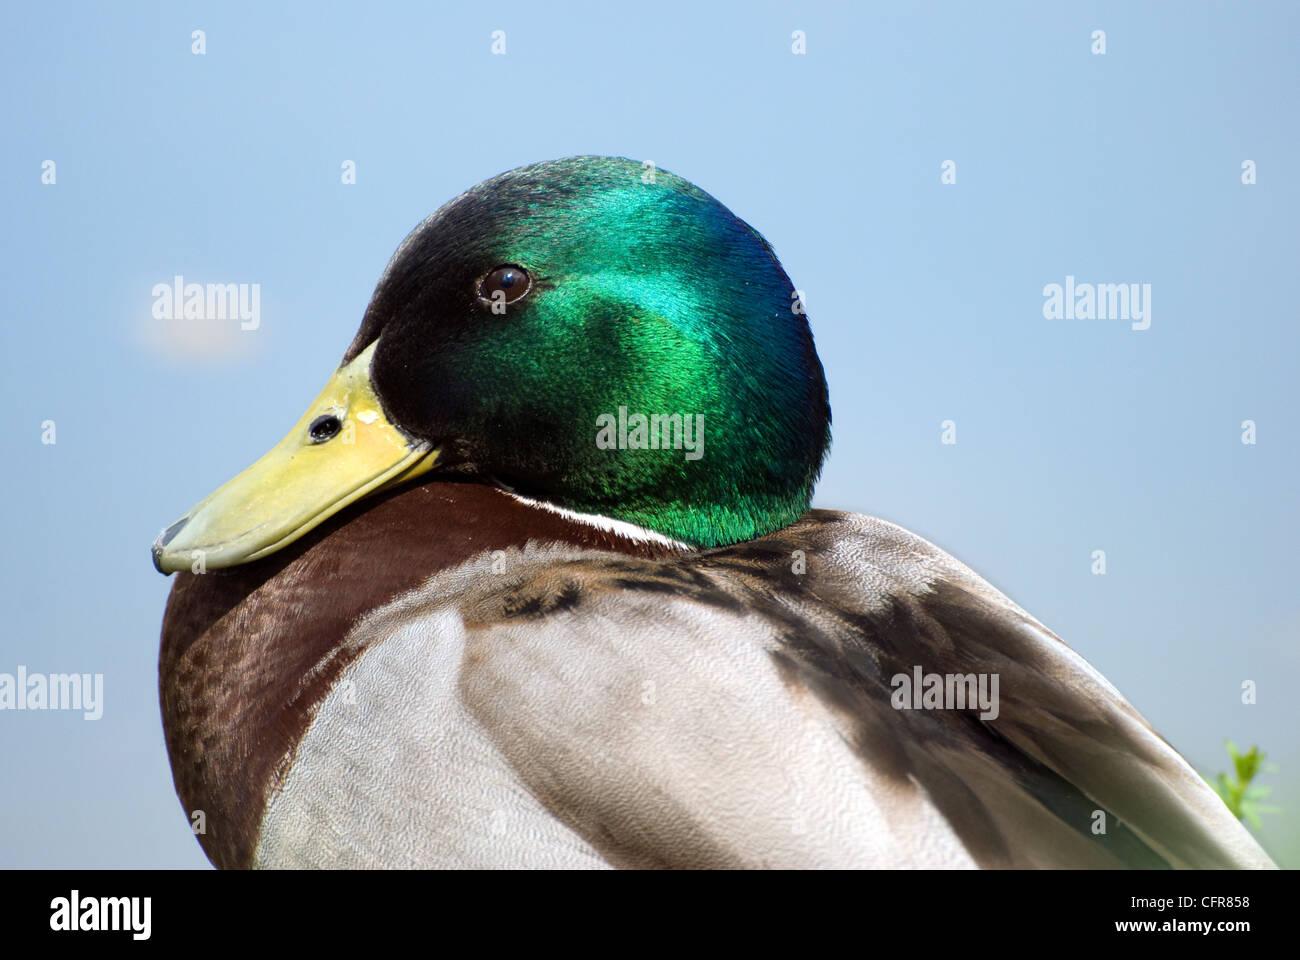 Close up shot of a male mallard duck, taken in Bristol, uk - Stock Image